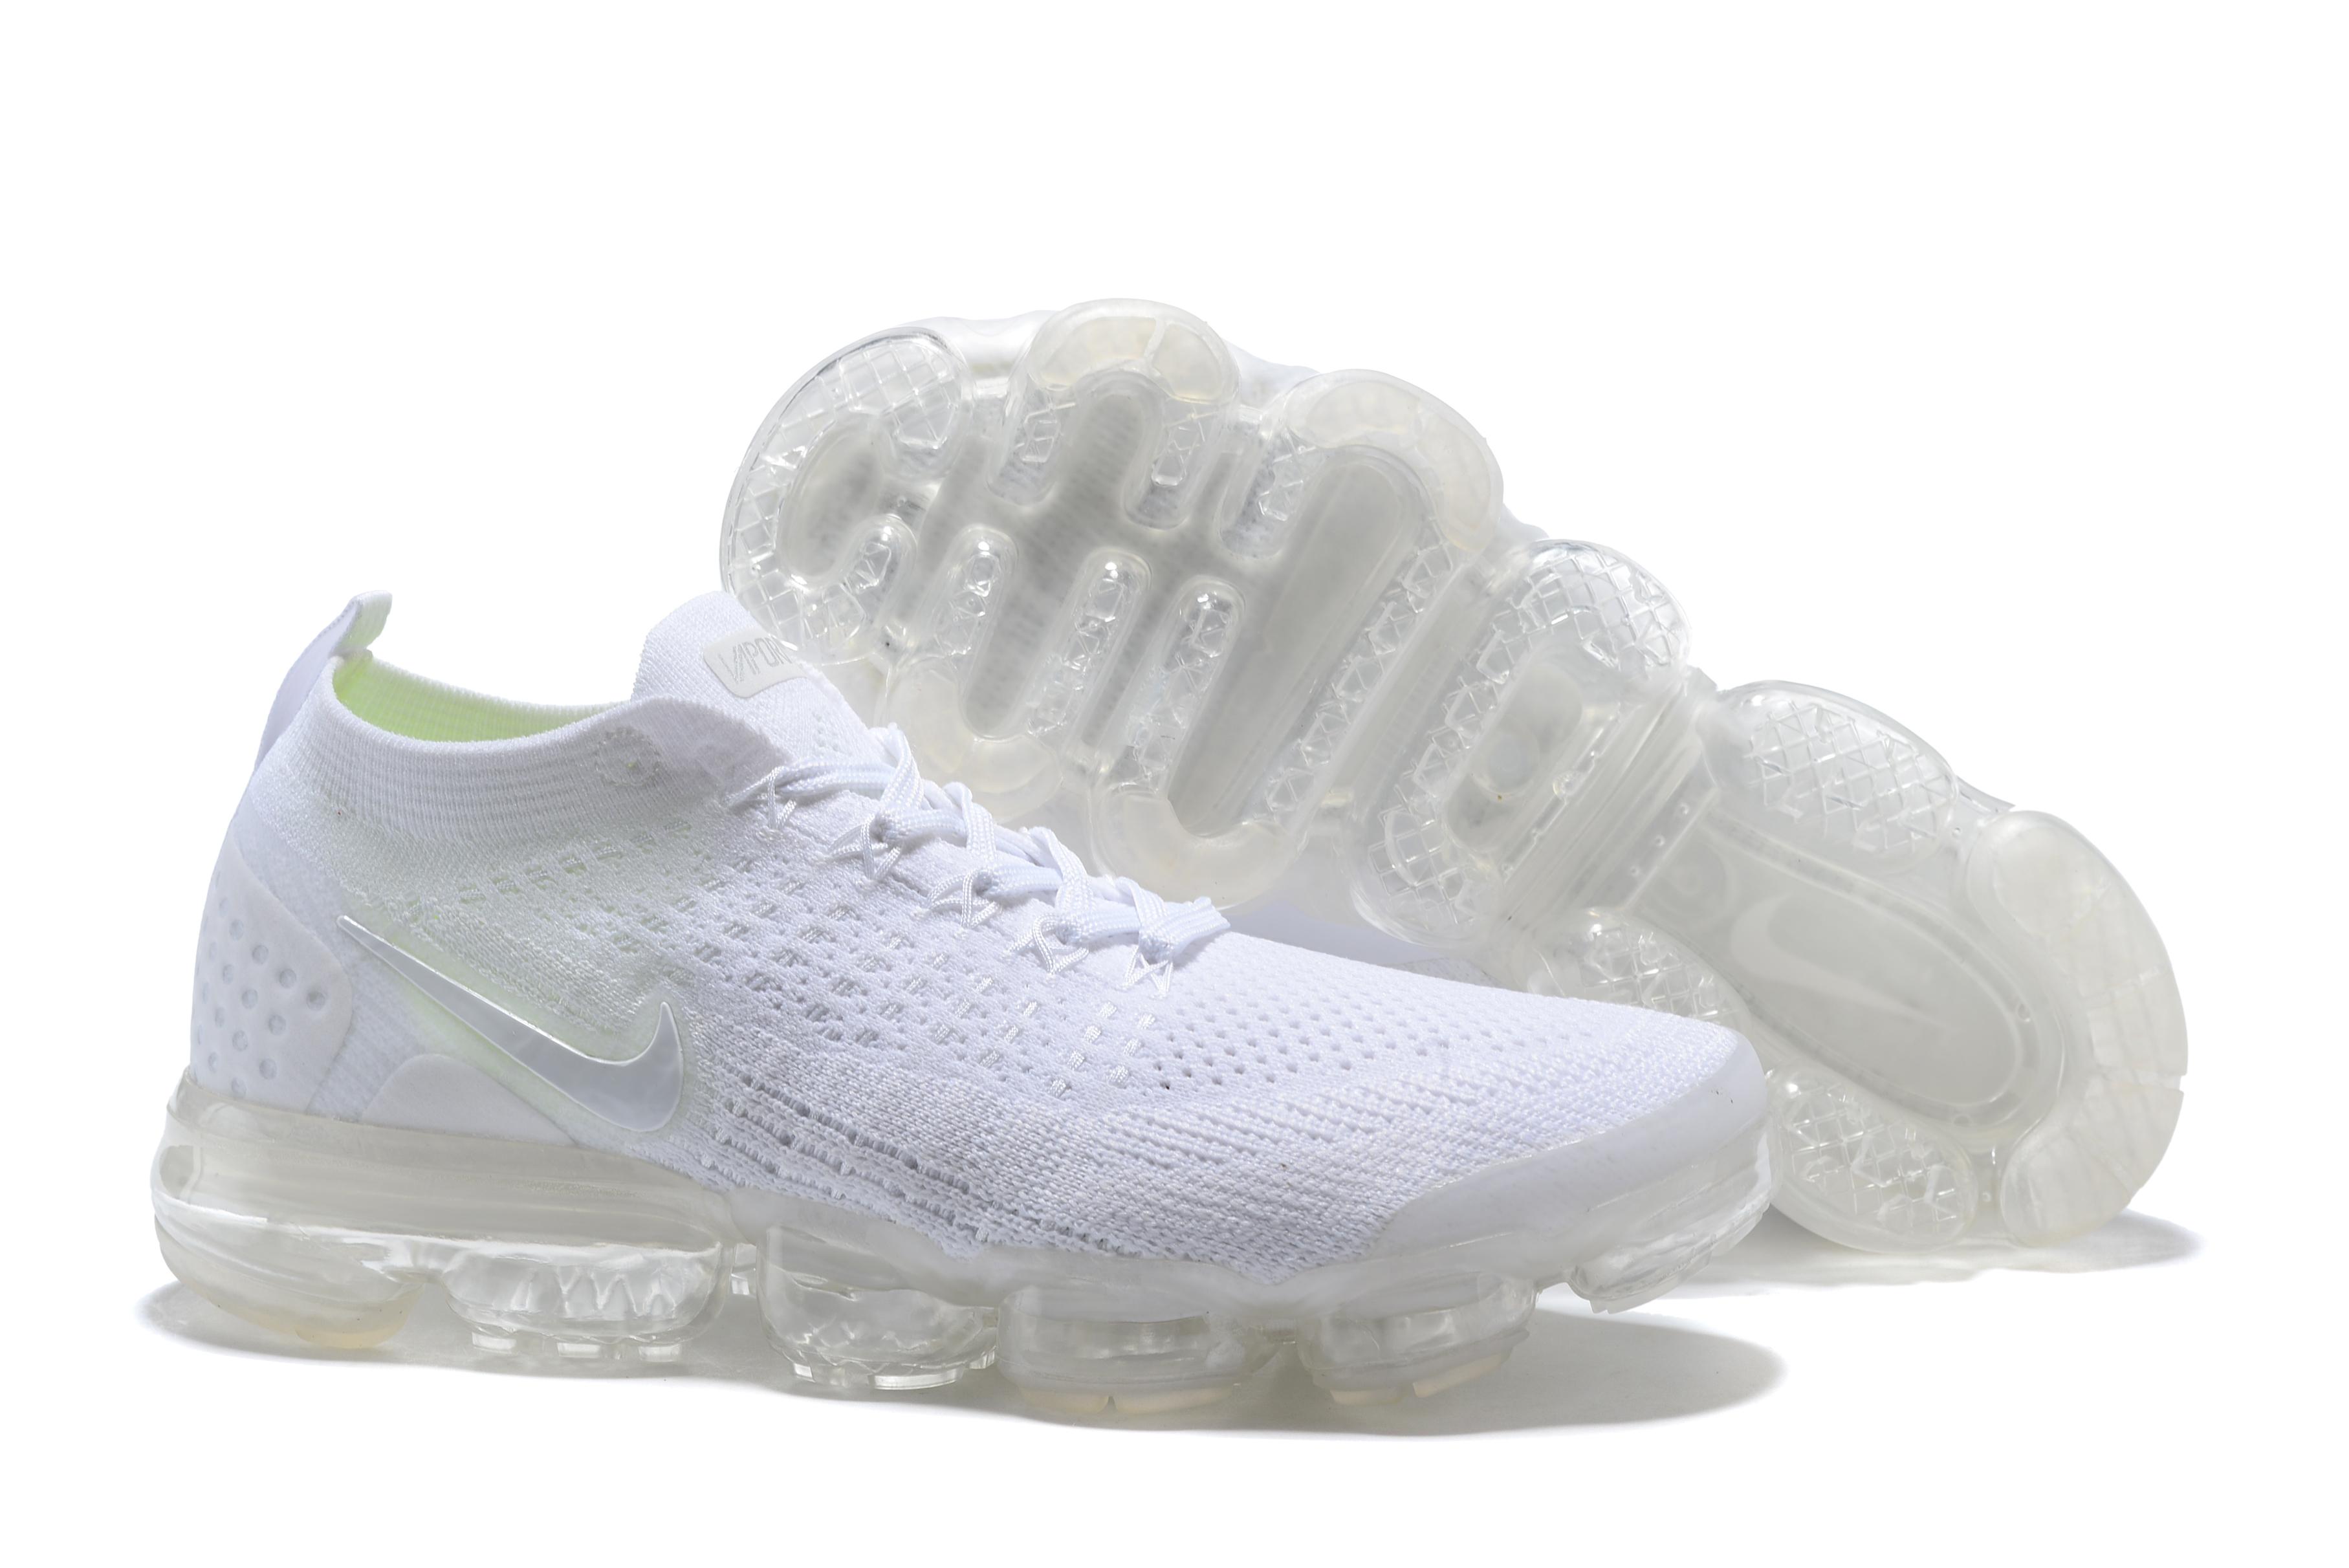 bf720245ae59 Nike Air VaporMax   Real Nike Running Shoes